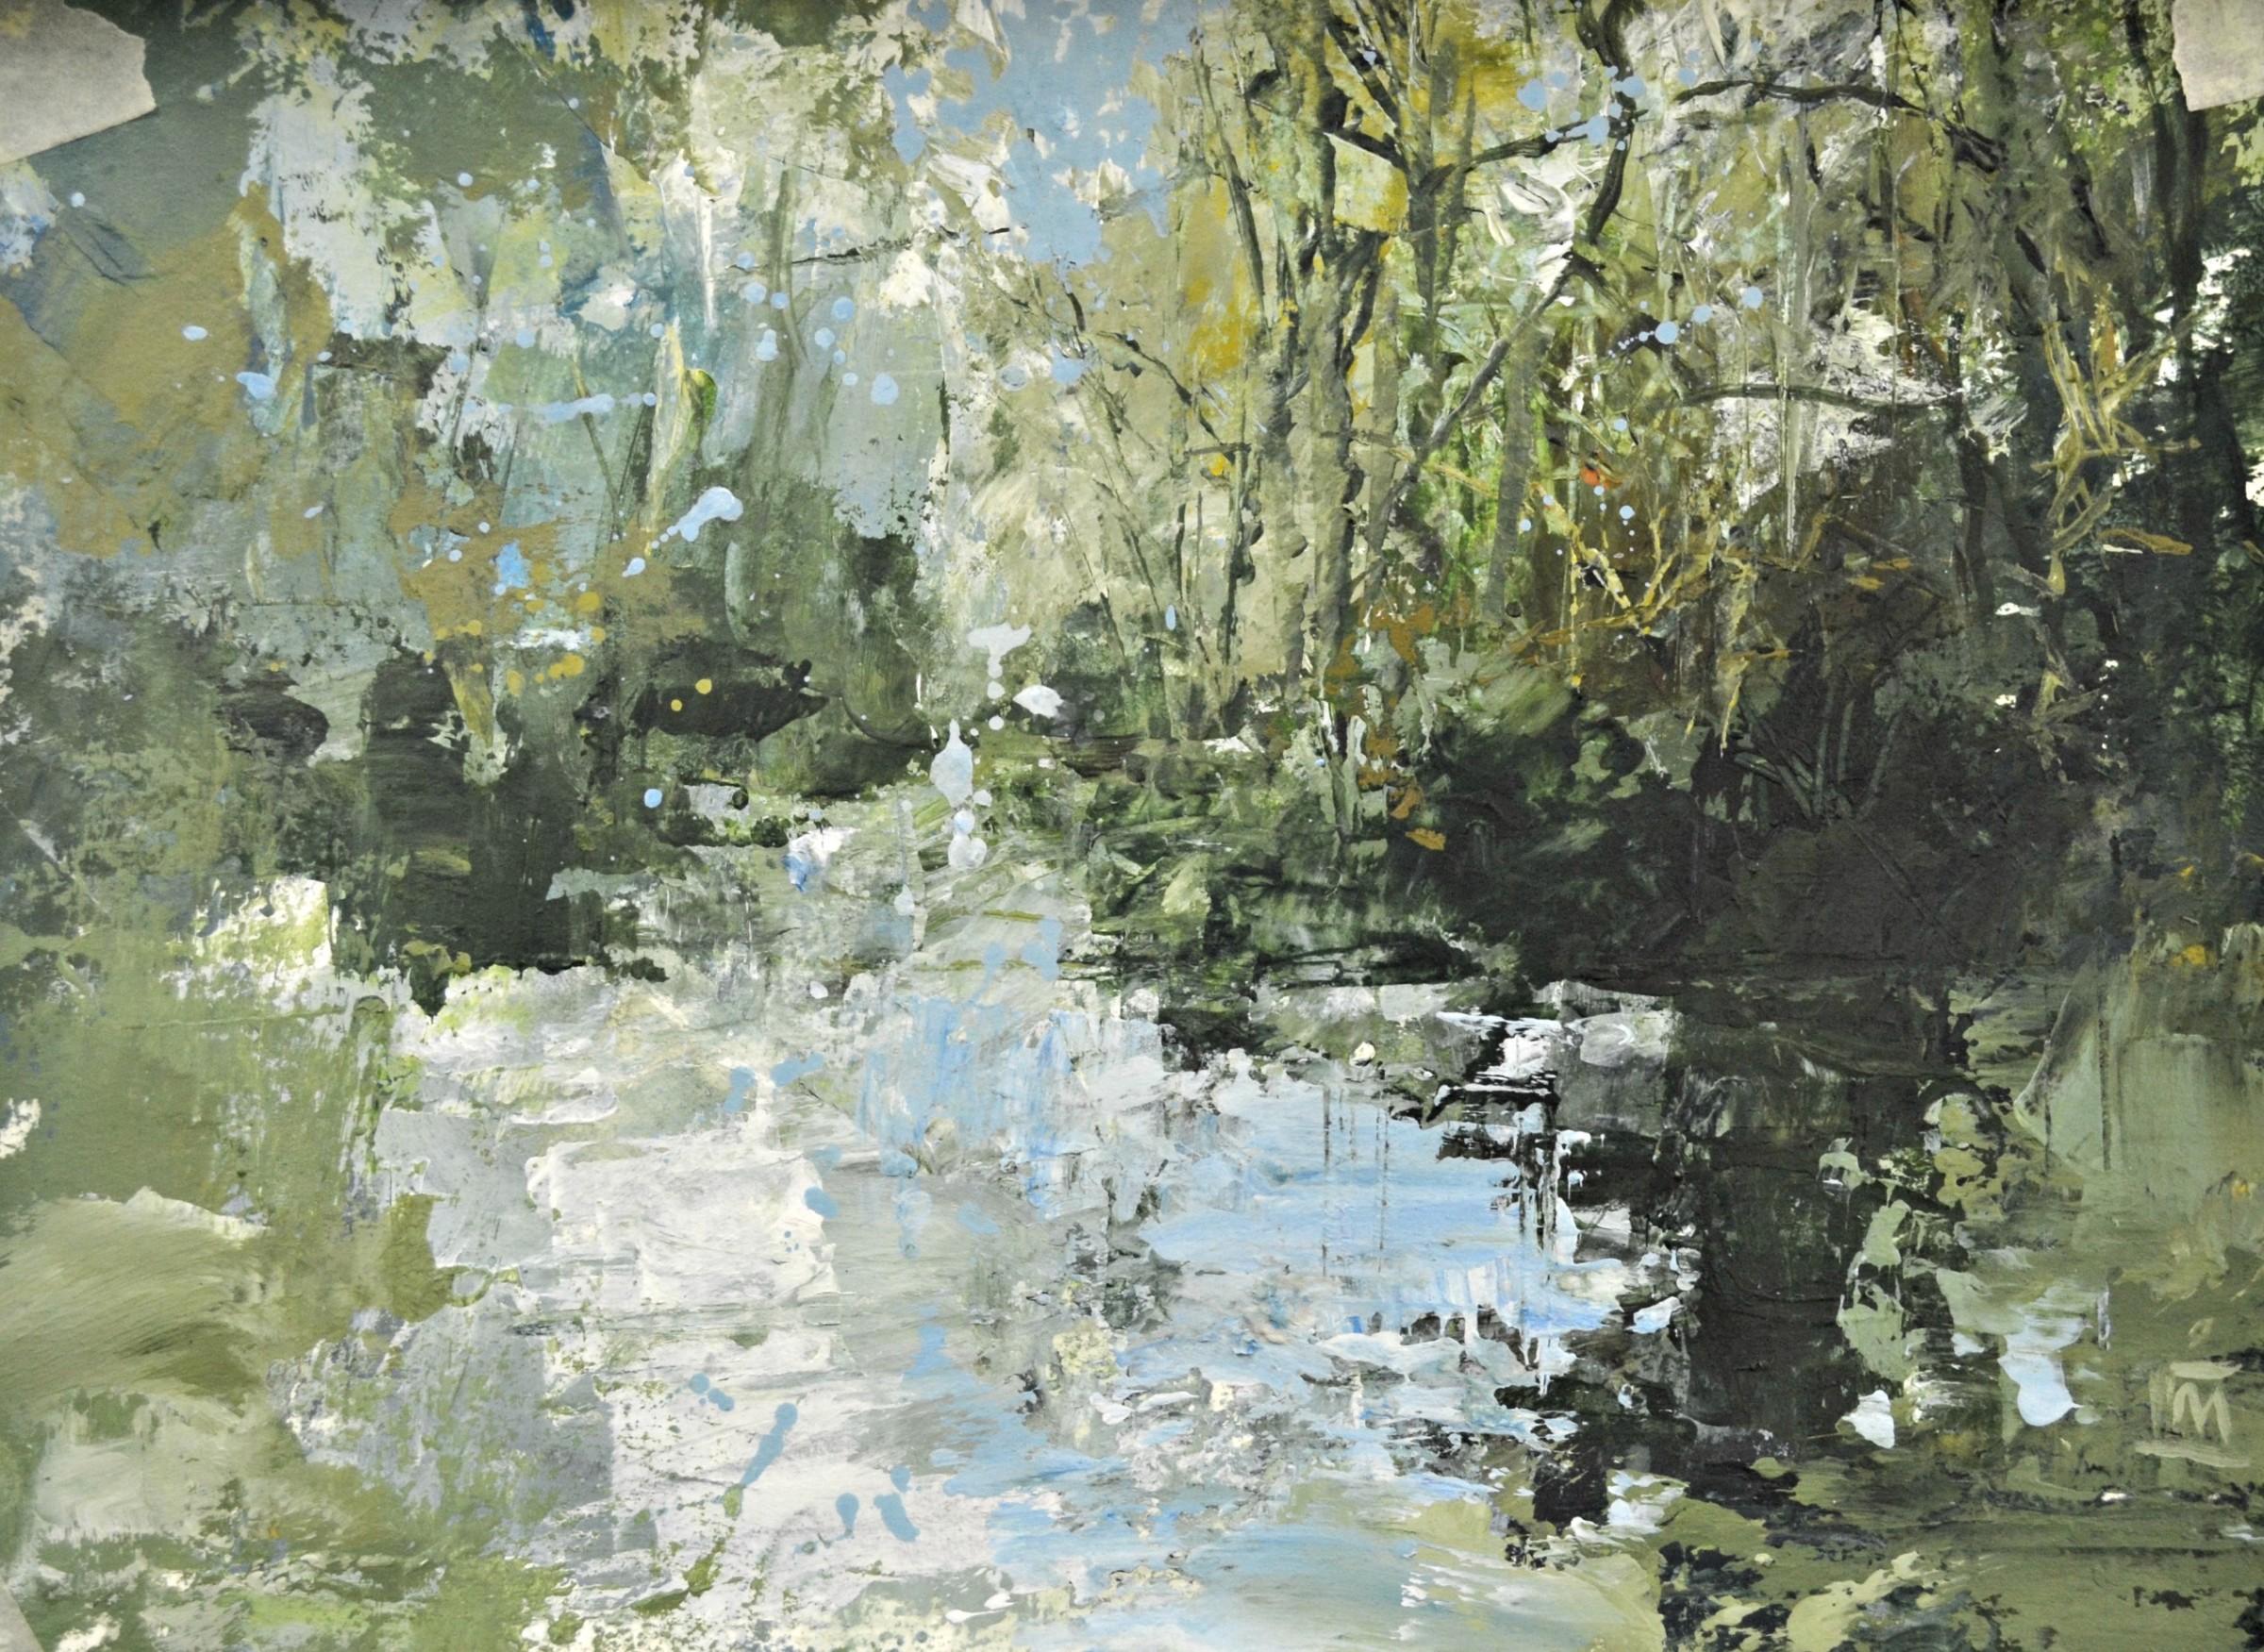 <span class=&#34;link fancybox-details-link&#34;><a href=&#34;/exhibitions/12/works/artworks_standalone9761/&#34;>View Detail Page</a></span><div class=&#34;artist&#34;><span class=&#34;artist&#34;><strong>Colin Merrin</strong></span></div><div class=&#34;title&#34;><em>Lydford Gorge, Study I</em></div><div class=&#34;medium&#34;>acrylic</div>